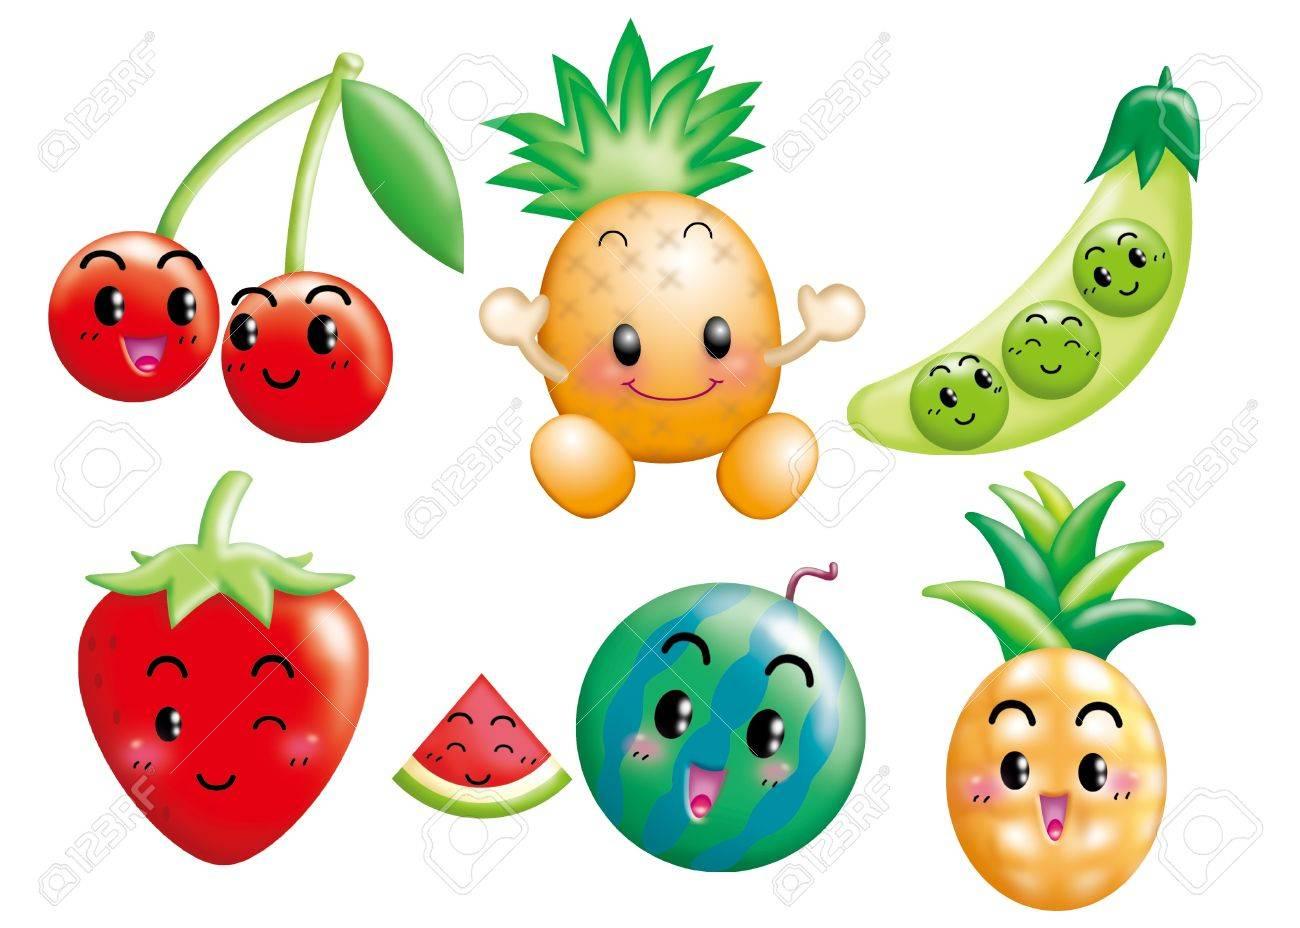 Cute cartoon design elements set -fruit, vegetable Stock Photo - 9003072